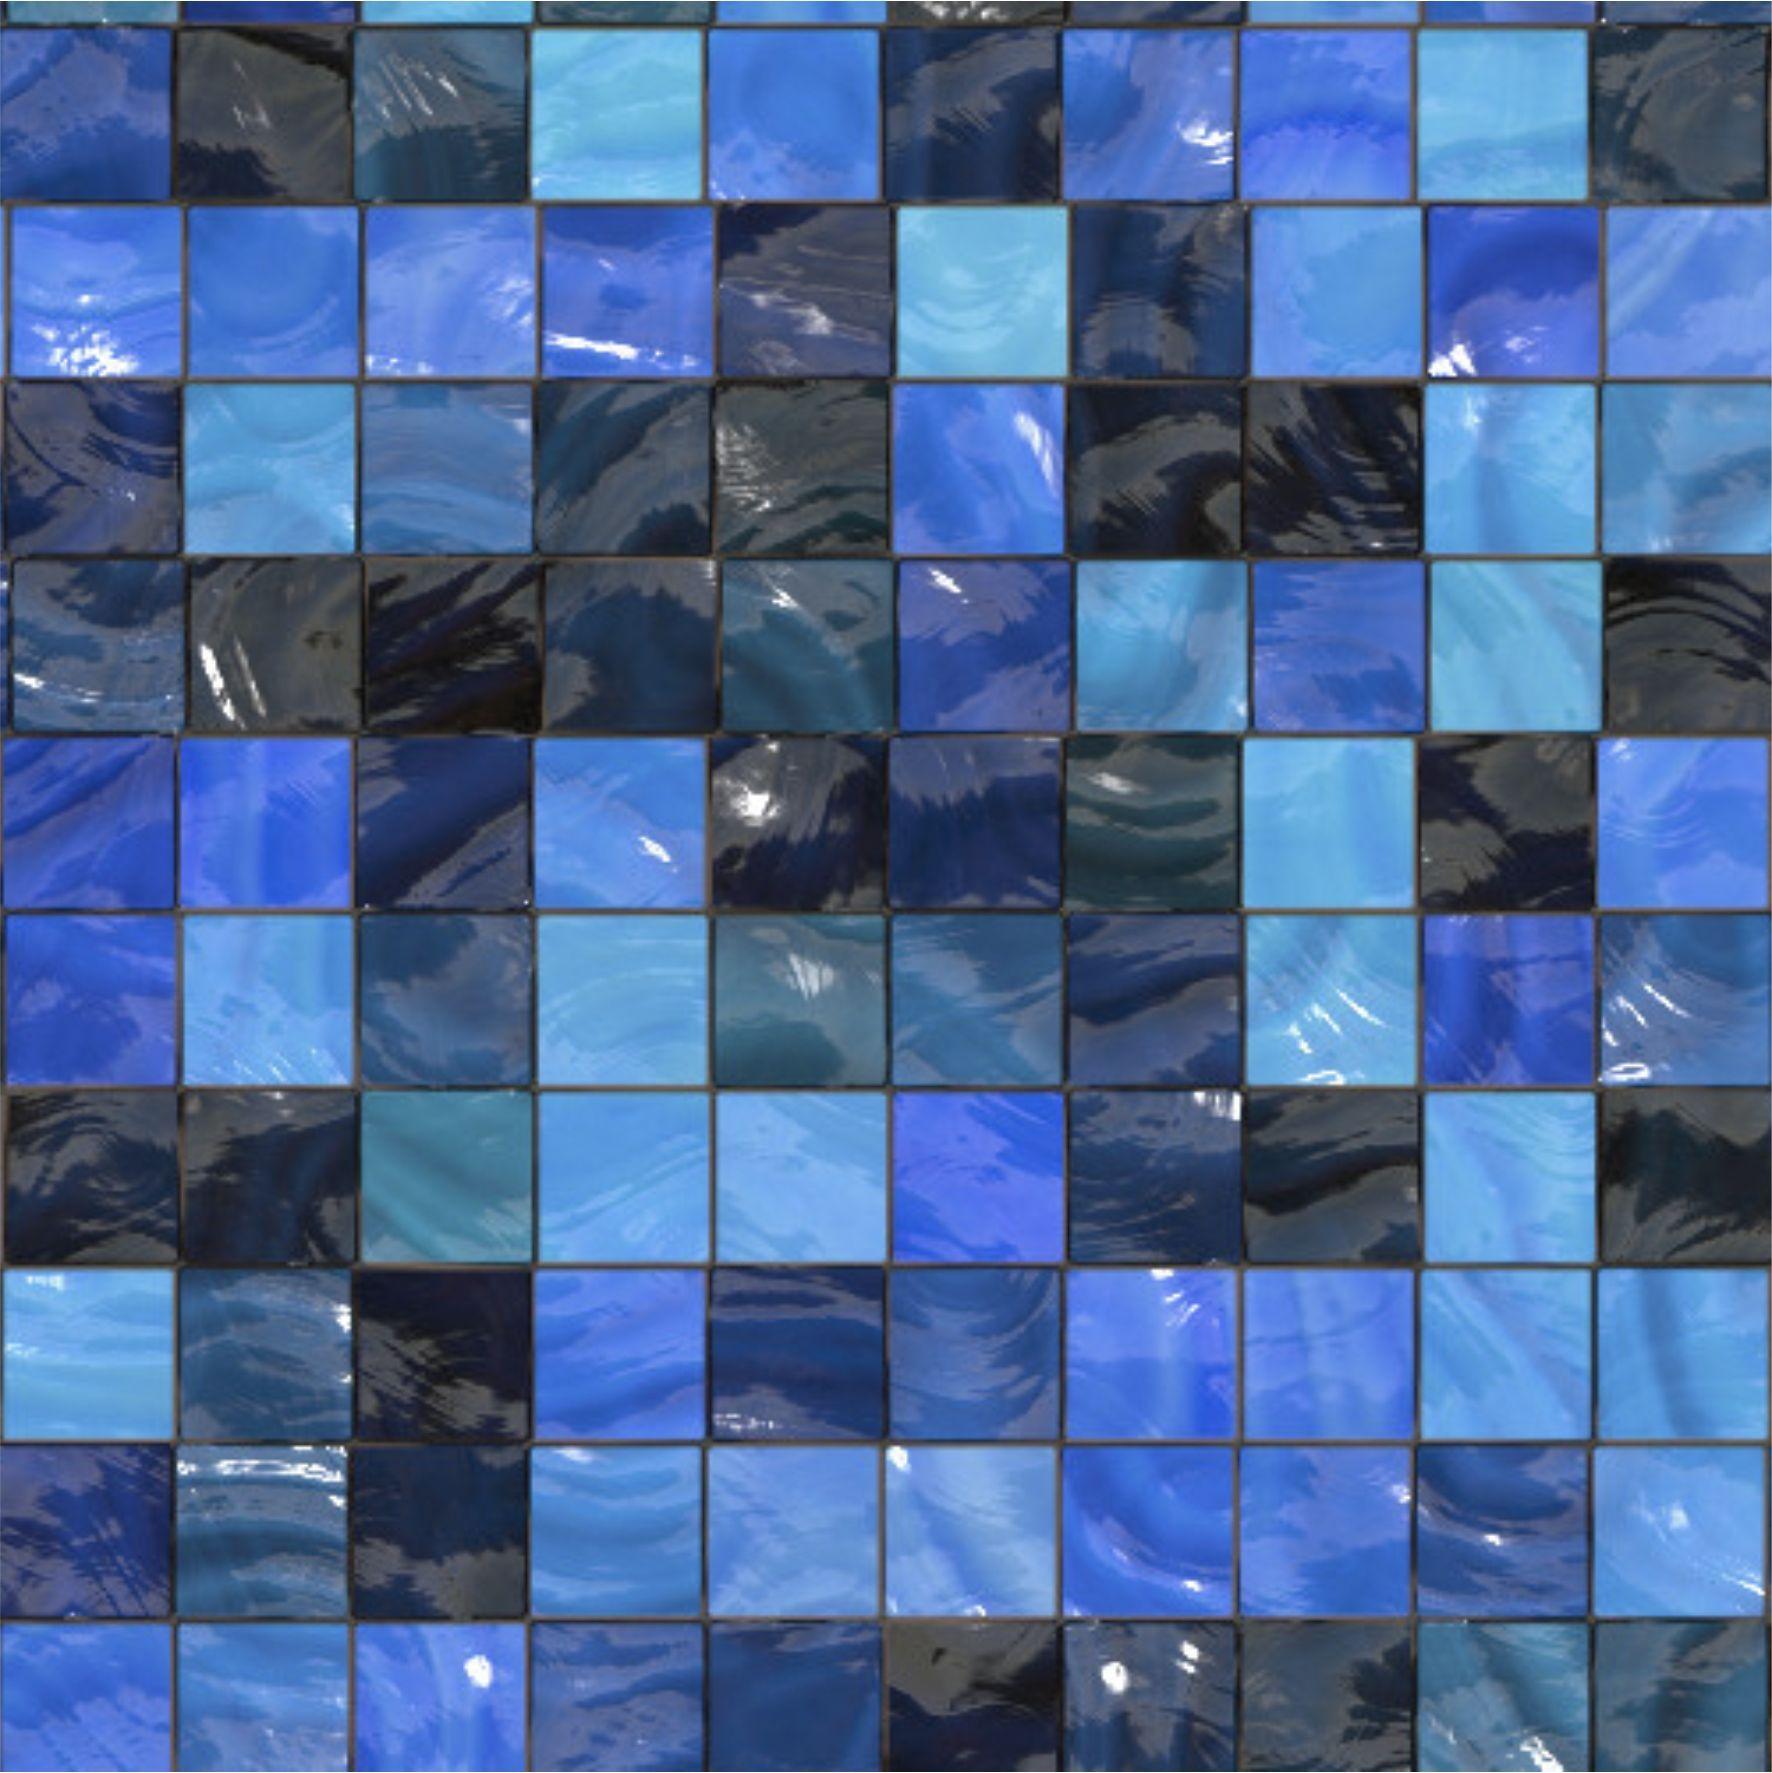 kit adesivo fruteira frete gratis sala kit adesivo fruteira frete  #1F6FAC 1772x1773 Banheiro Com Pastilhas De Vidro Azul